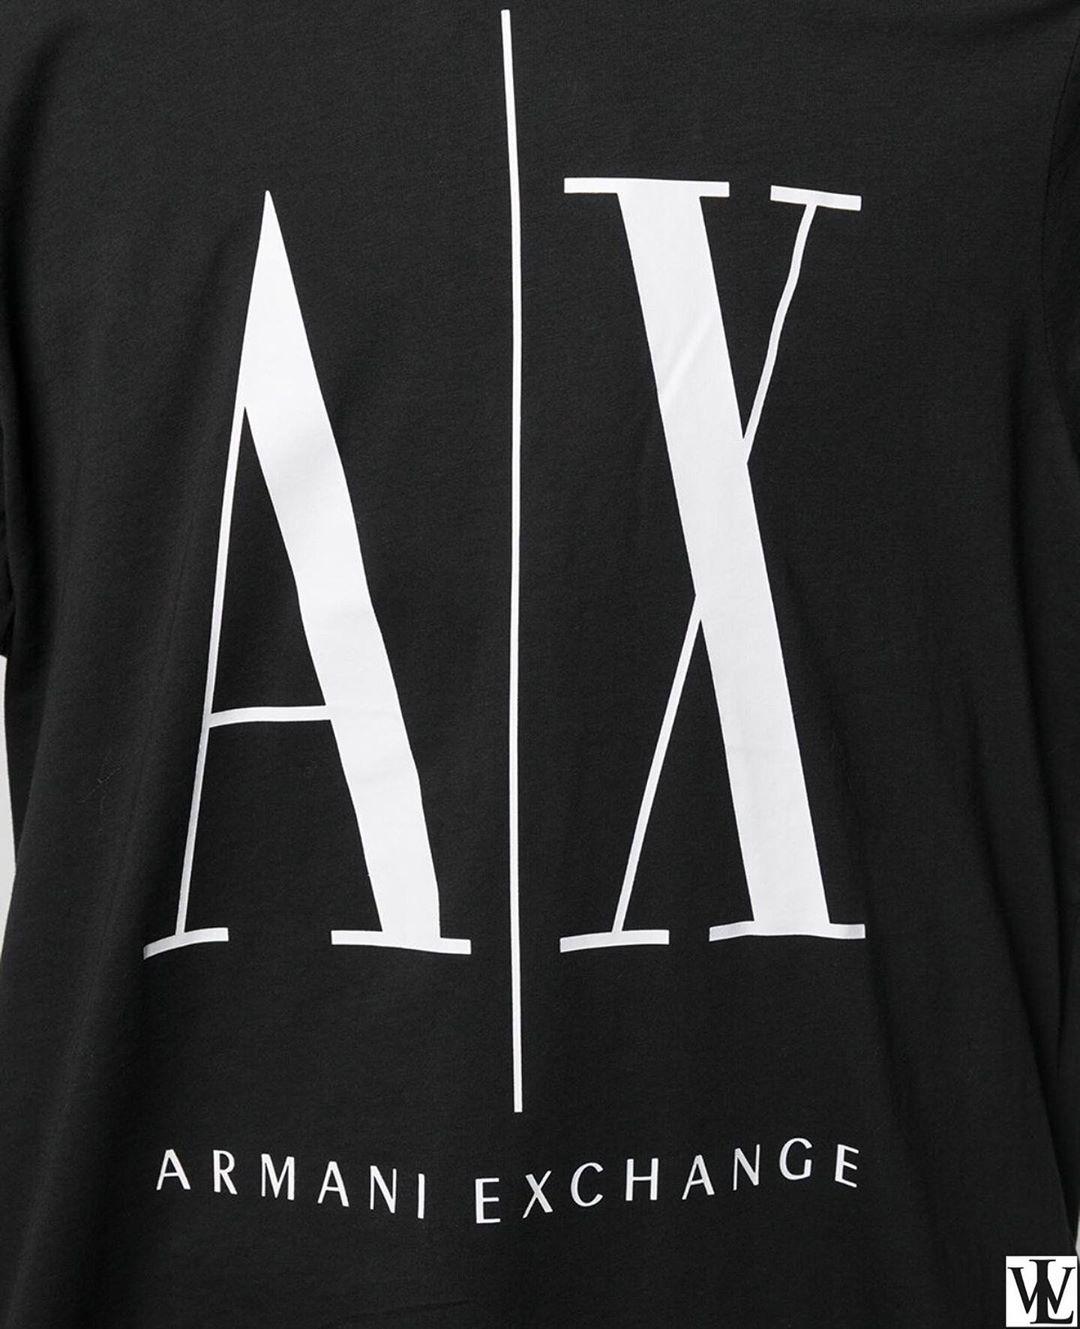 T Shirt Slim Fit Black T Shirt Men %100 Cotton Print New Session Luxury Wear  Print Short Sleeve T-shirt  8NZTPAZJH4Z